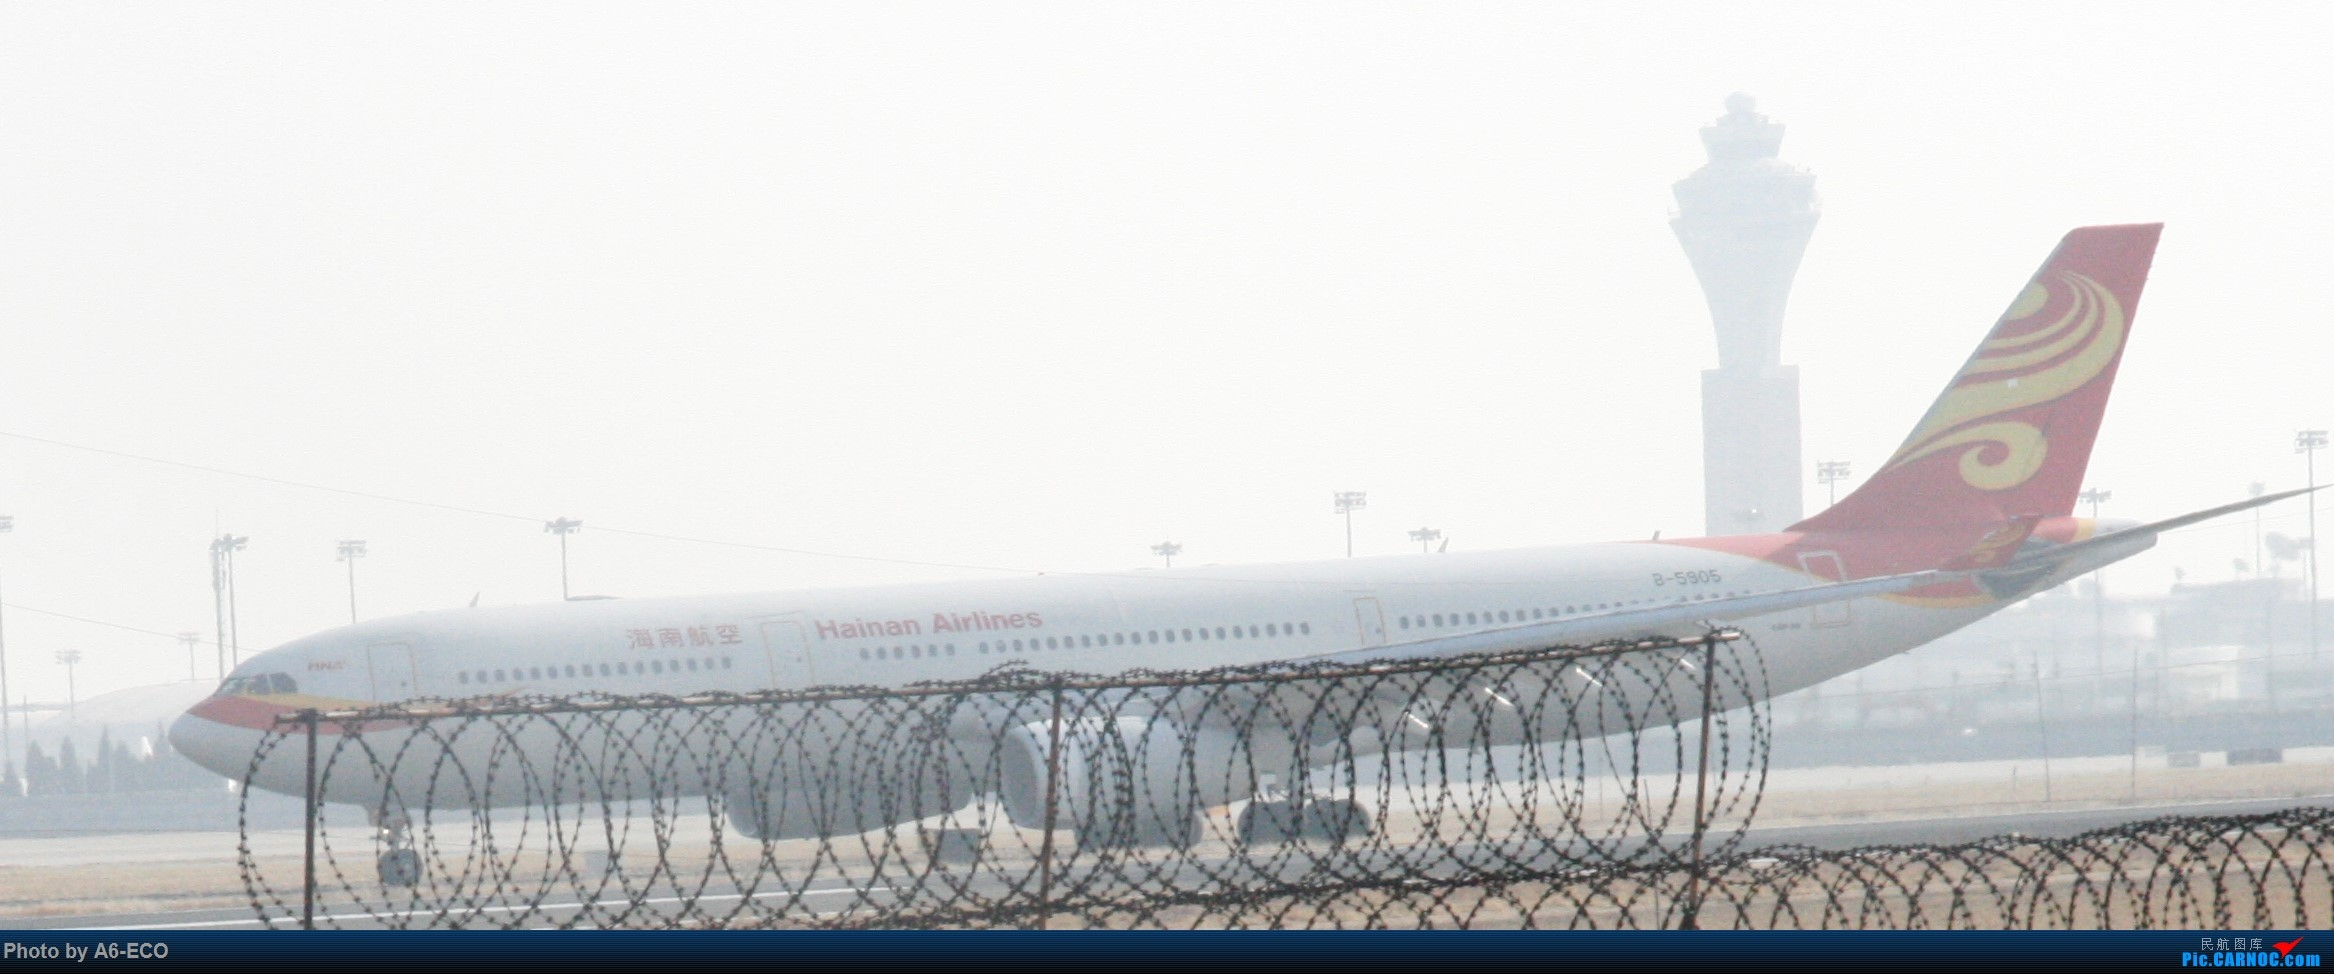 Re:[原创]今天运气极好,云南孔雀,B-1070,2个菜航邮戳,泡菜航彩绘,东航邮戳...... AIRBUS A330-300 B-5905 中国北京首都国际机场